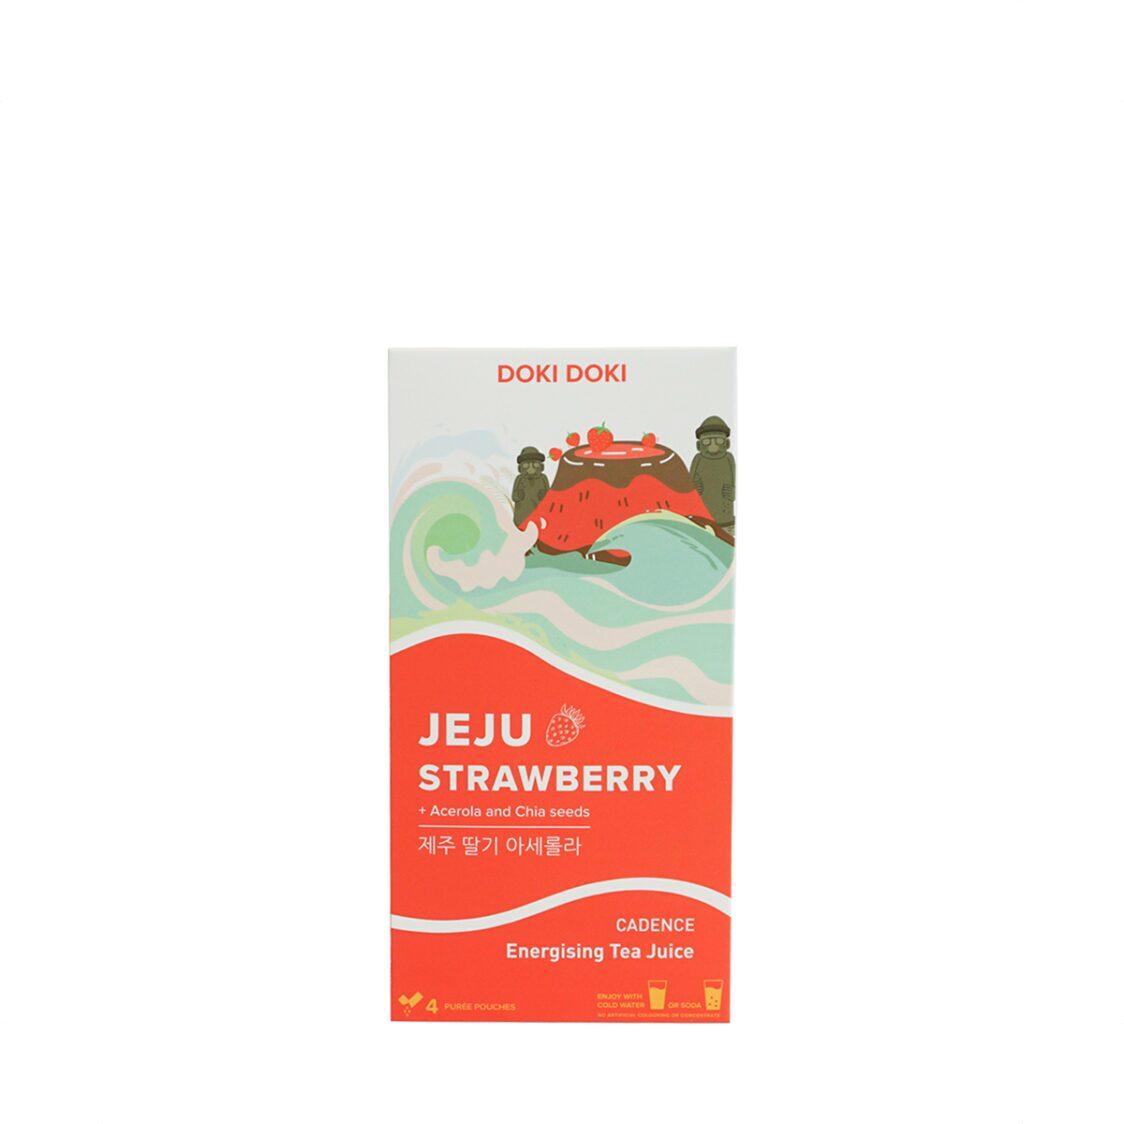 Doki Doki Energising Tea Juice - Jeju Strawberry